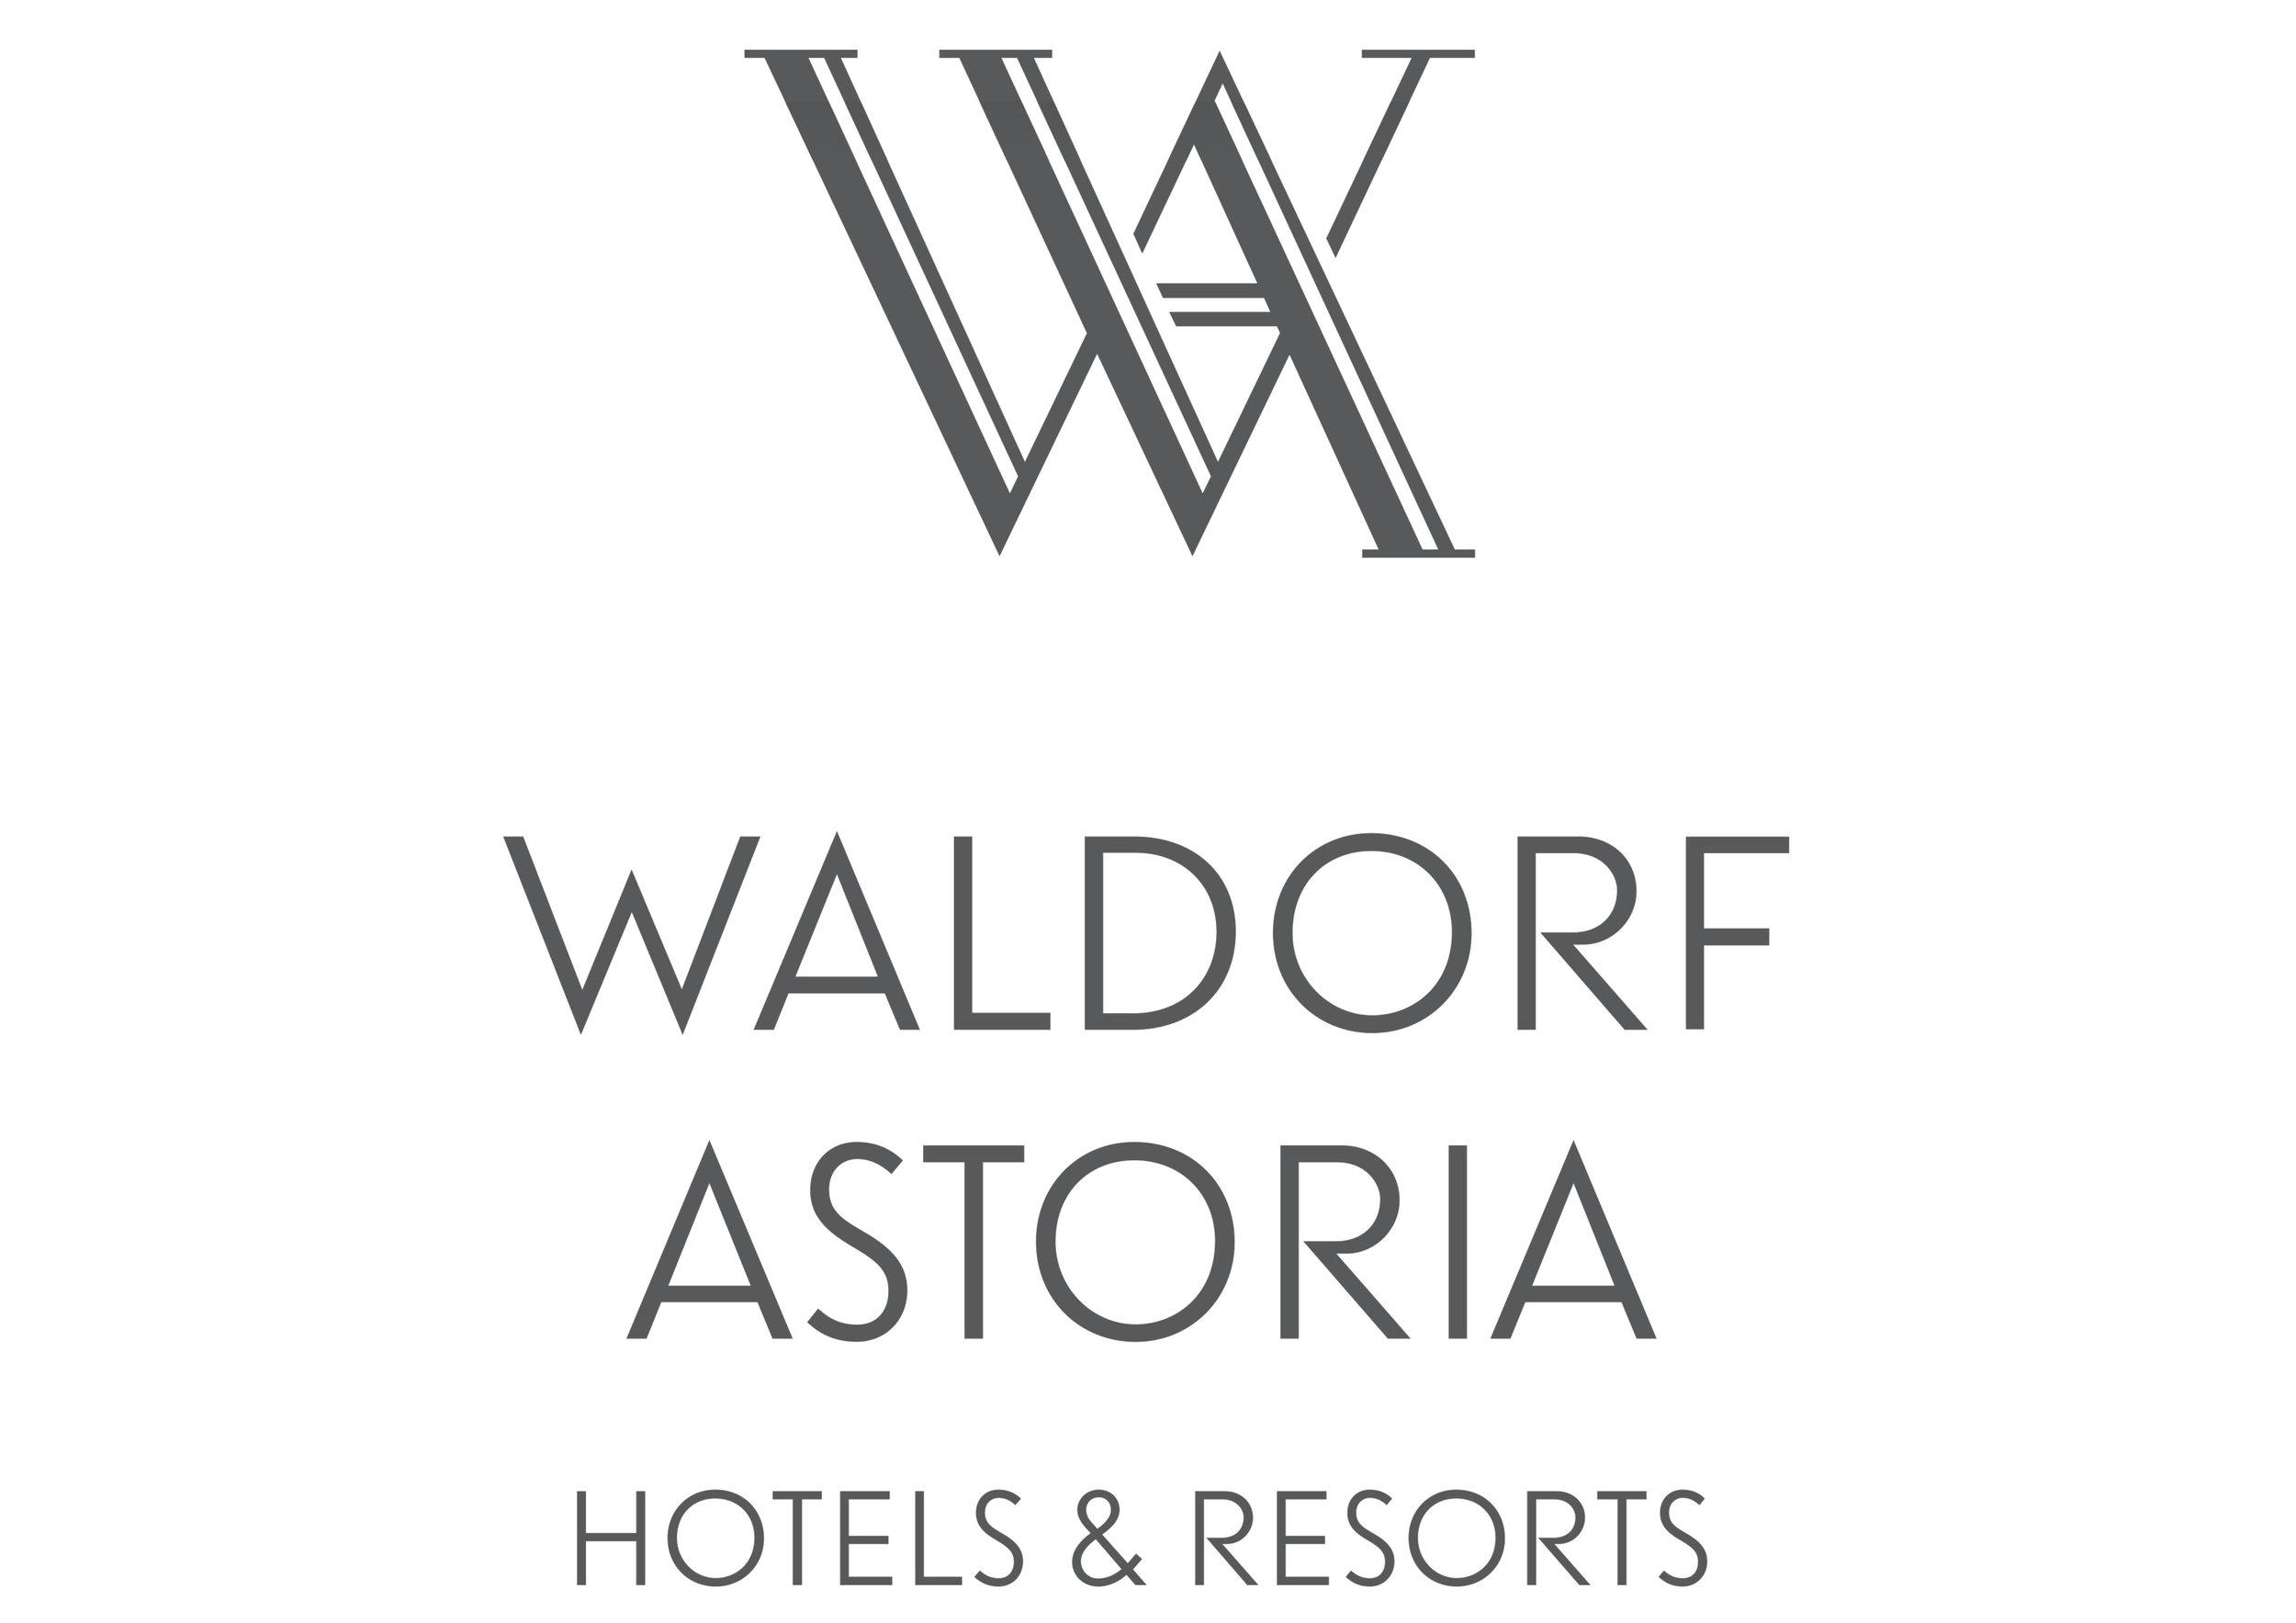 Waldorf-Astoria.jpg